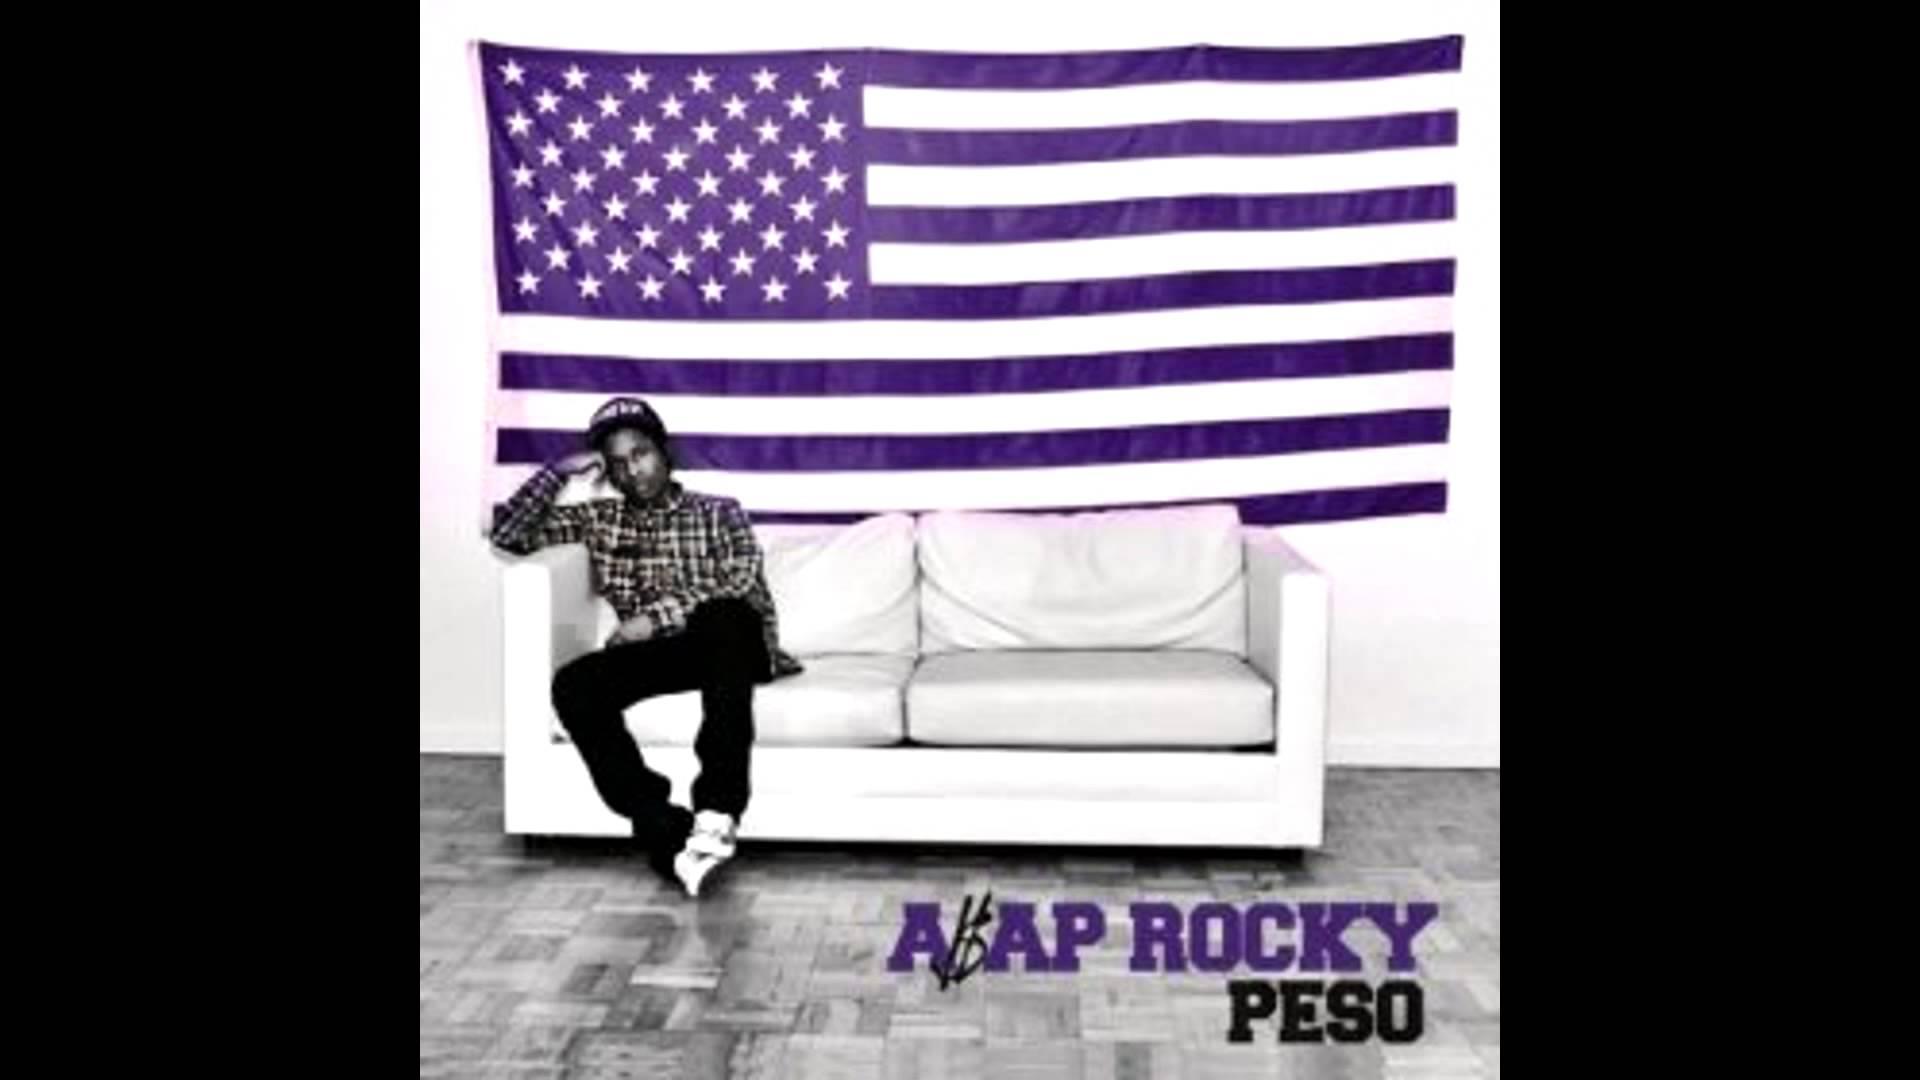 Peso ASAP Rocky Wallpapers - Top Free Peso ASAP Rocky